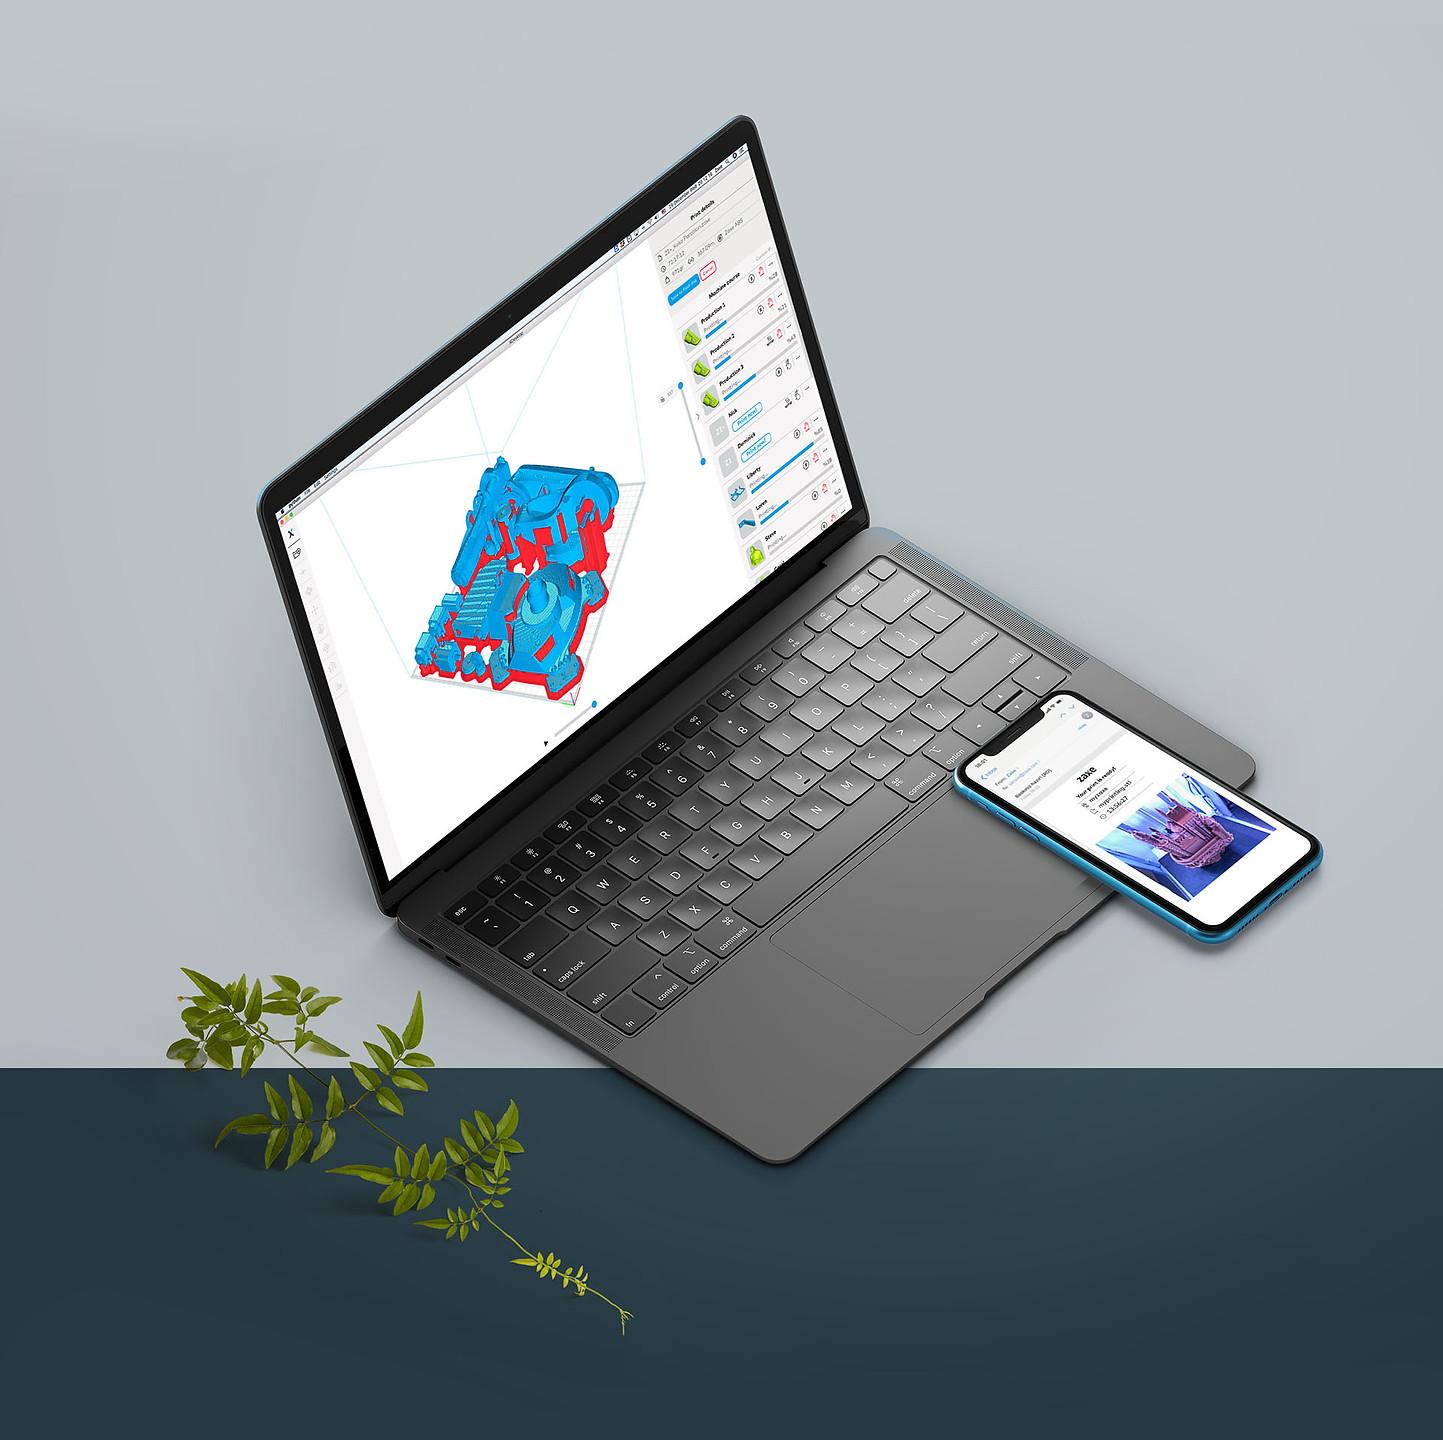 zaxe_desktop.jpg